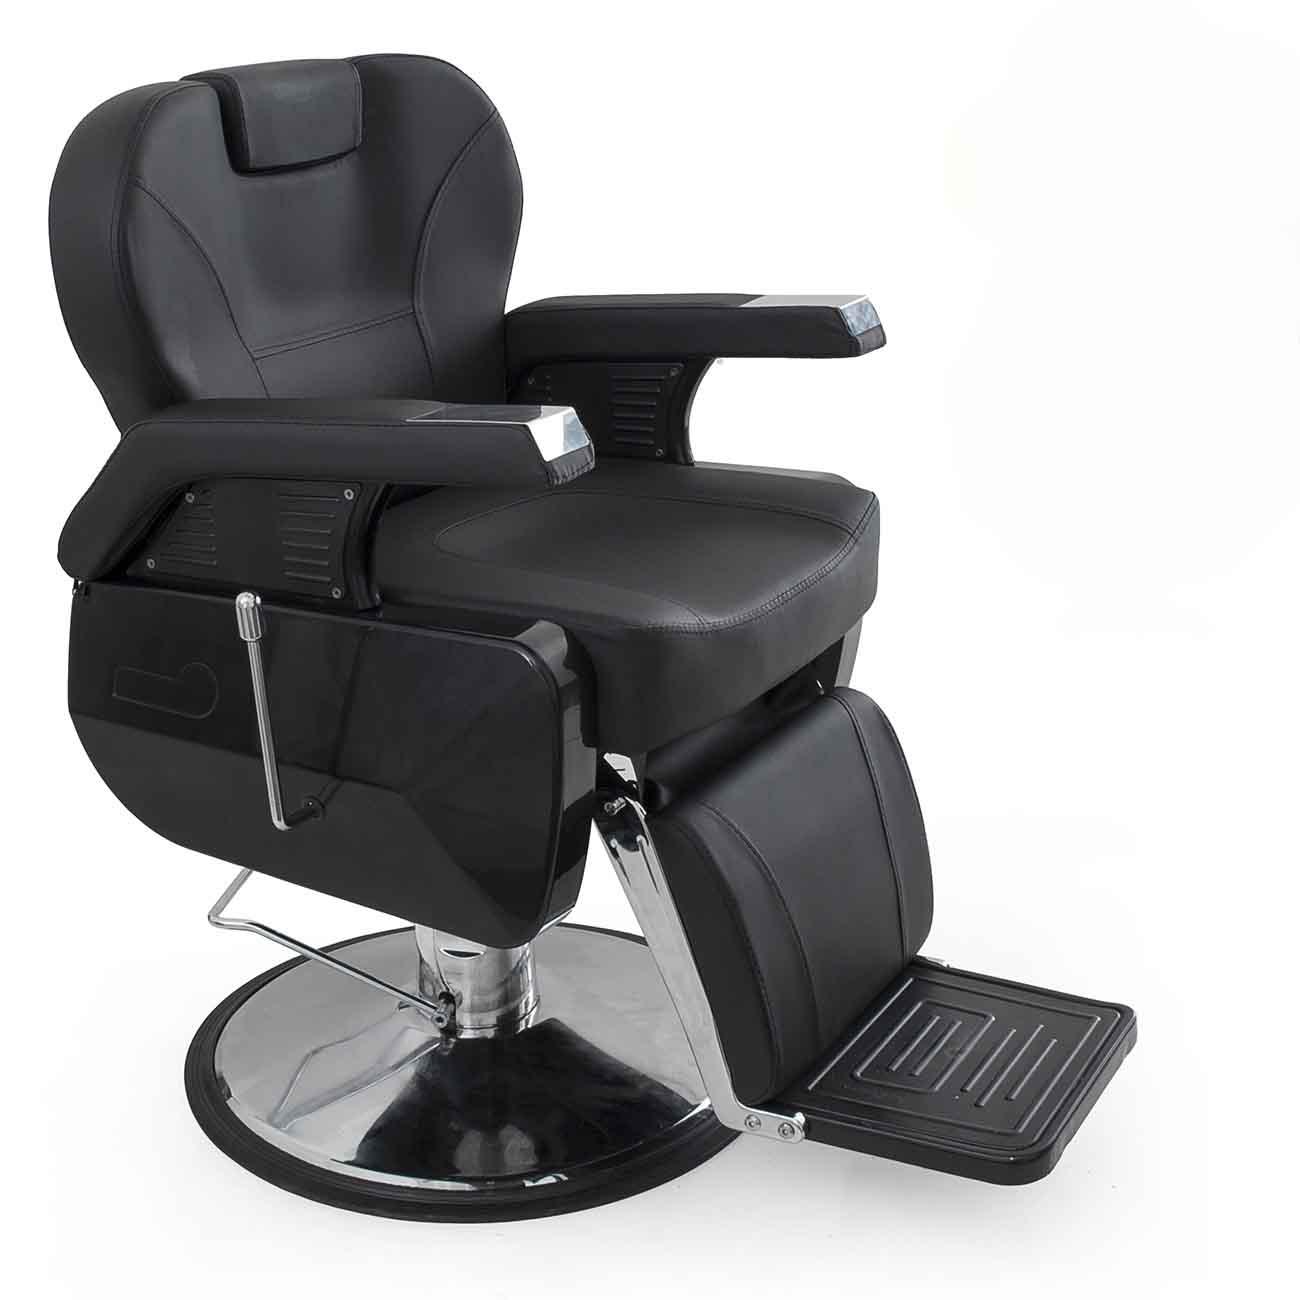 Bellavie Hydraulic Barber Chair Reclining Salon Equipment Black Walmart Com Walmart Com